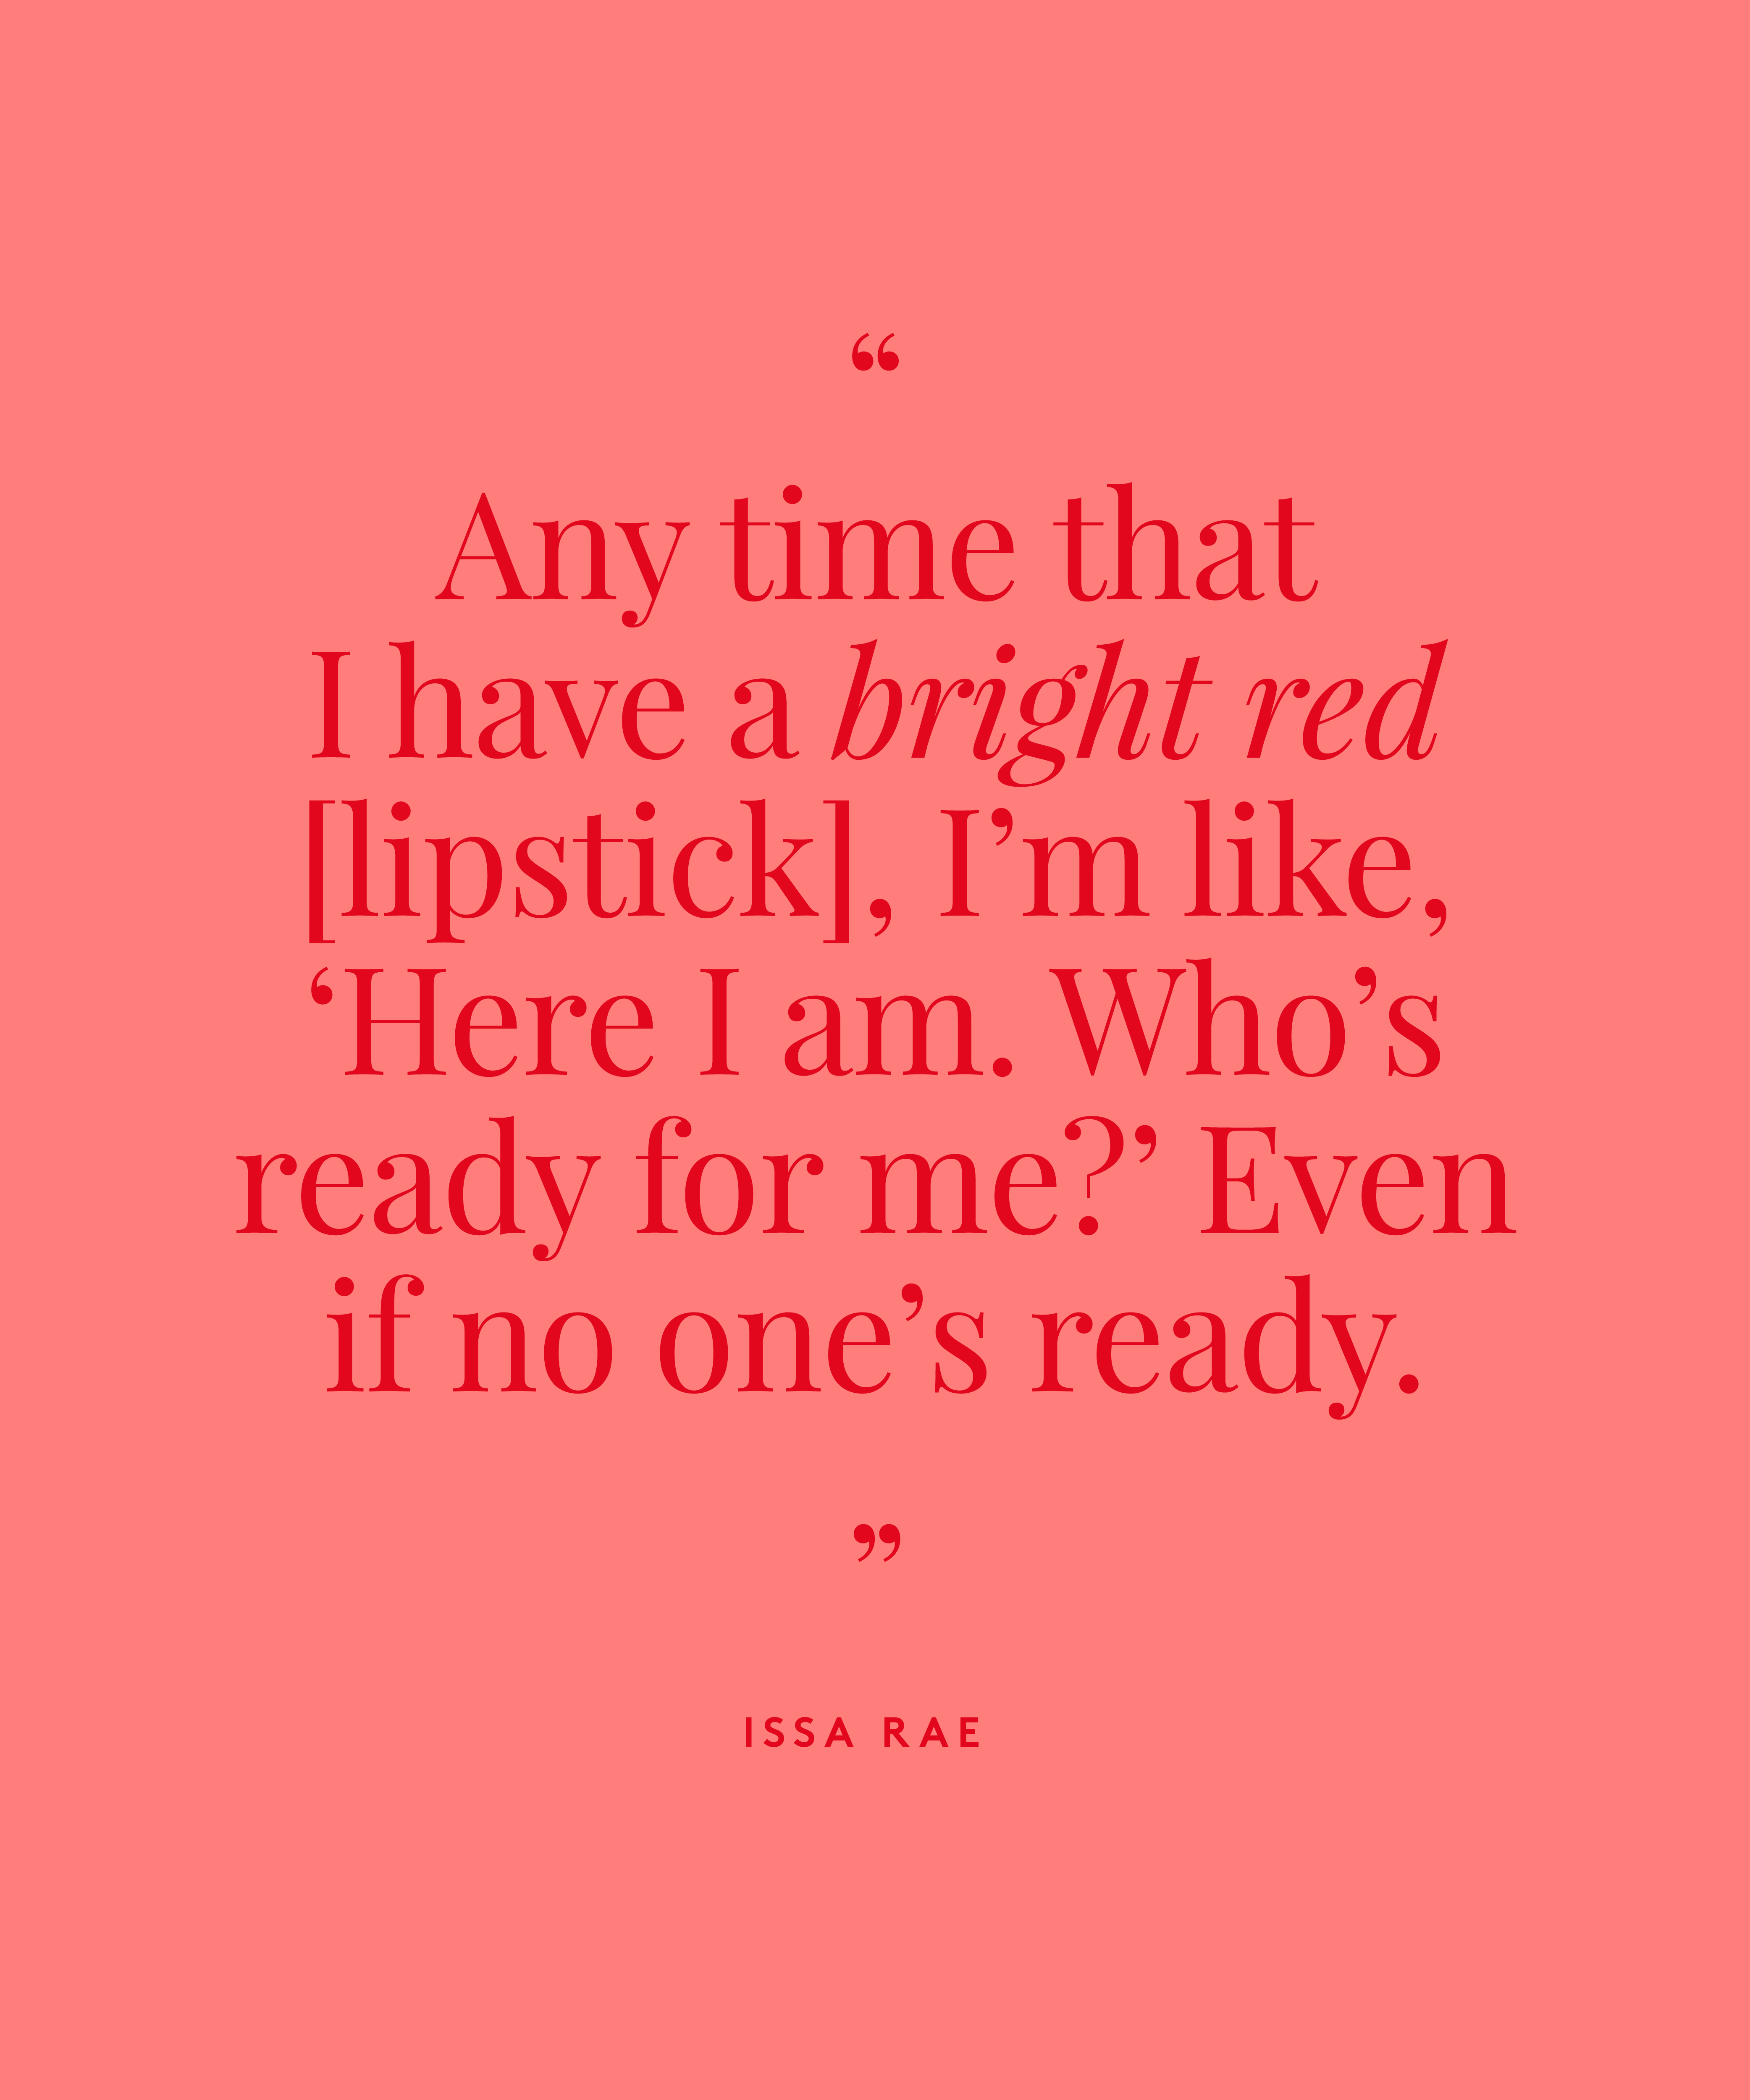 Best Lipstick Quotes For Your Next Instagram Caption